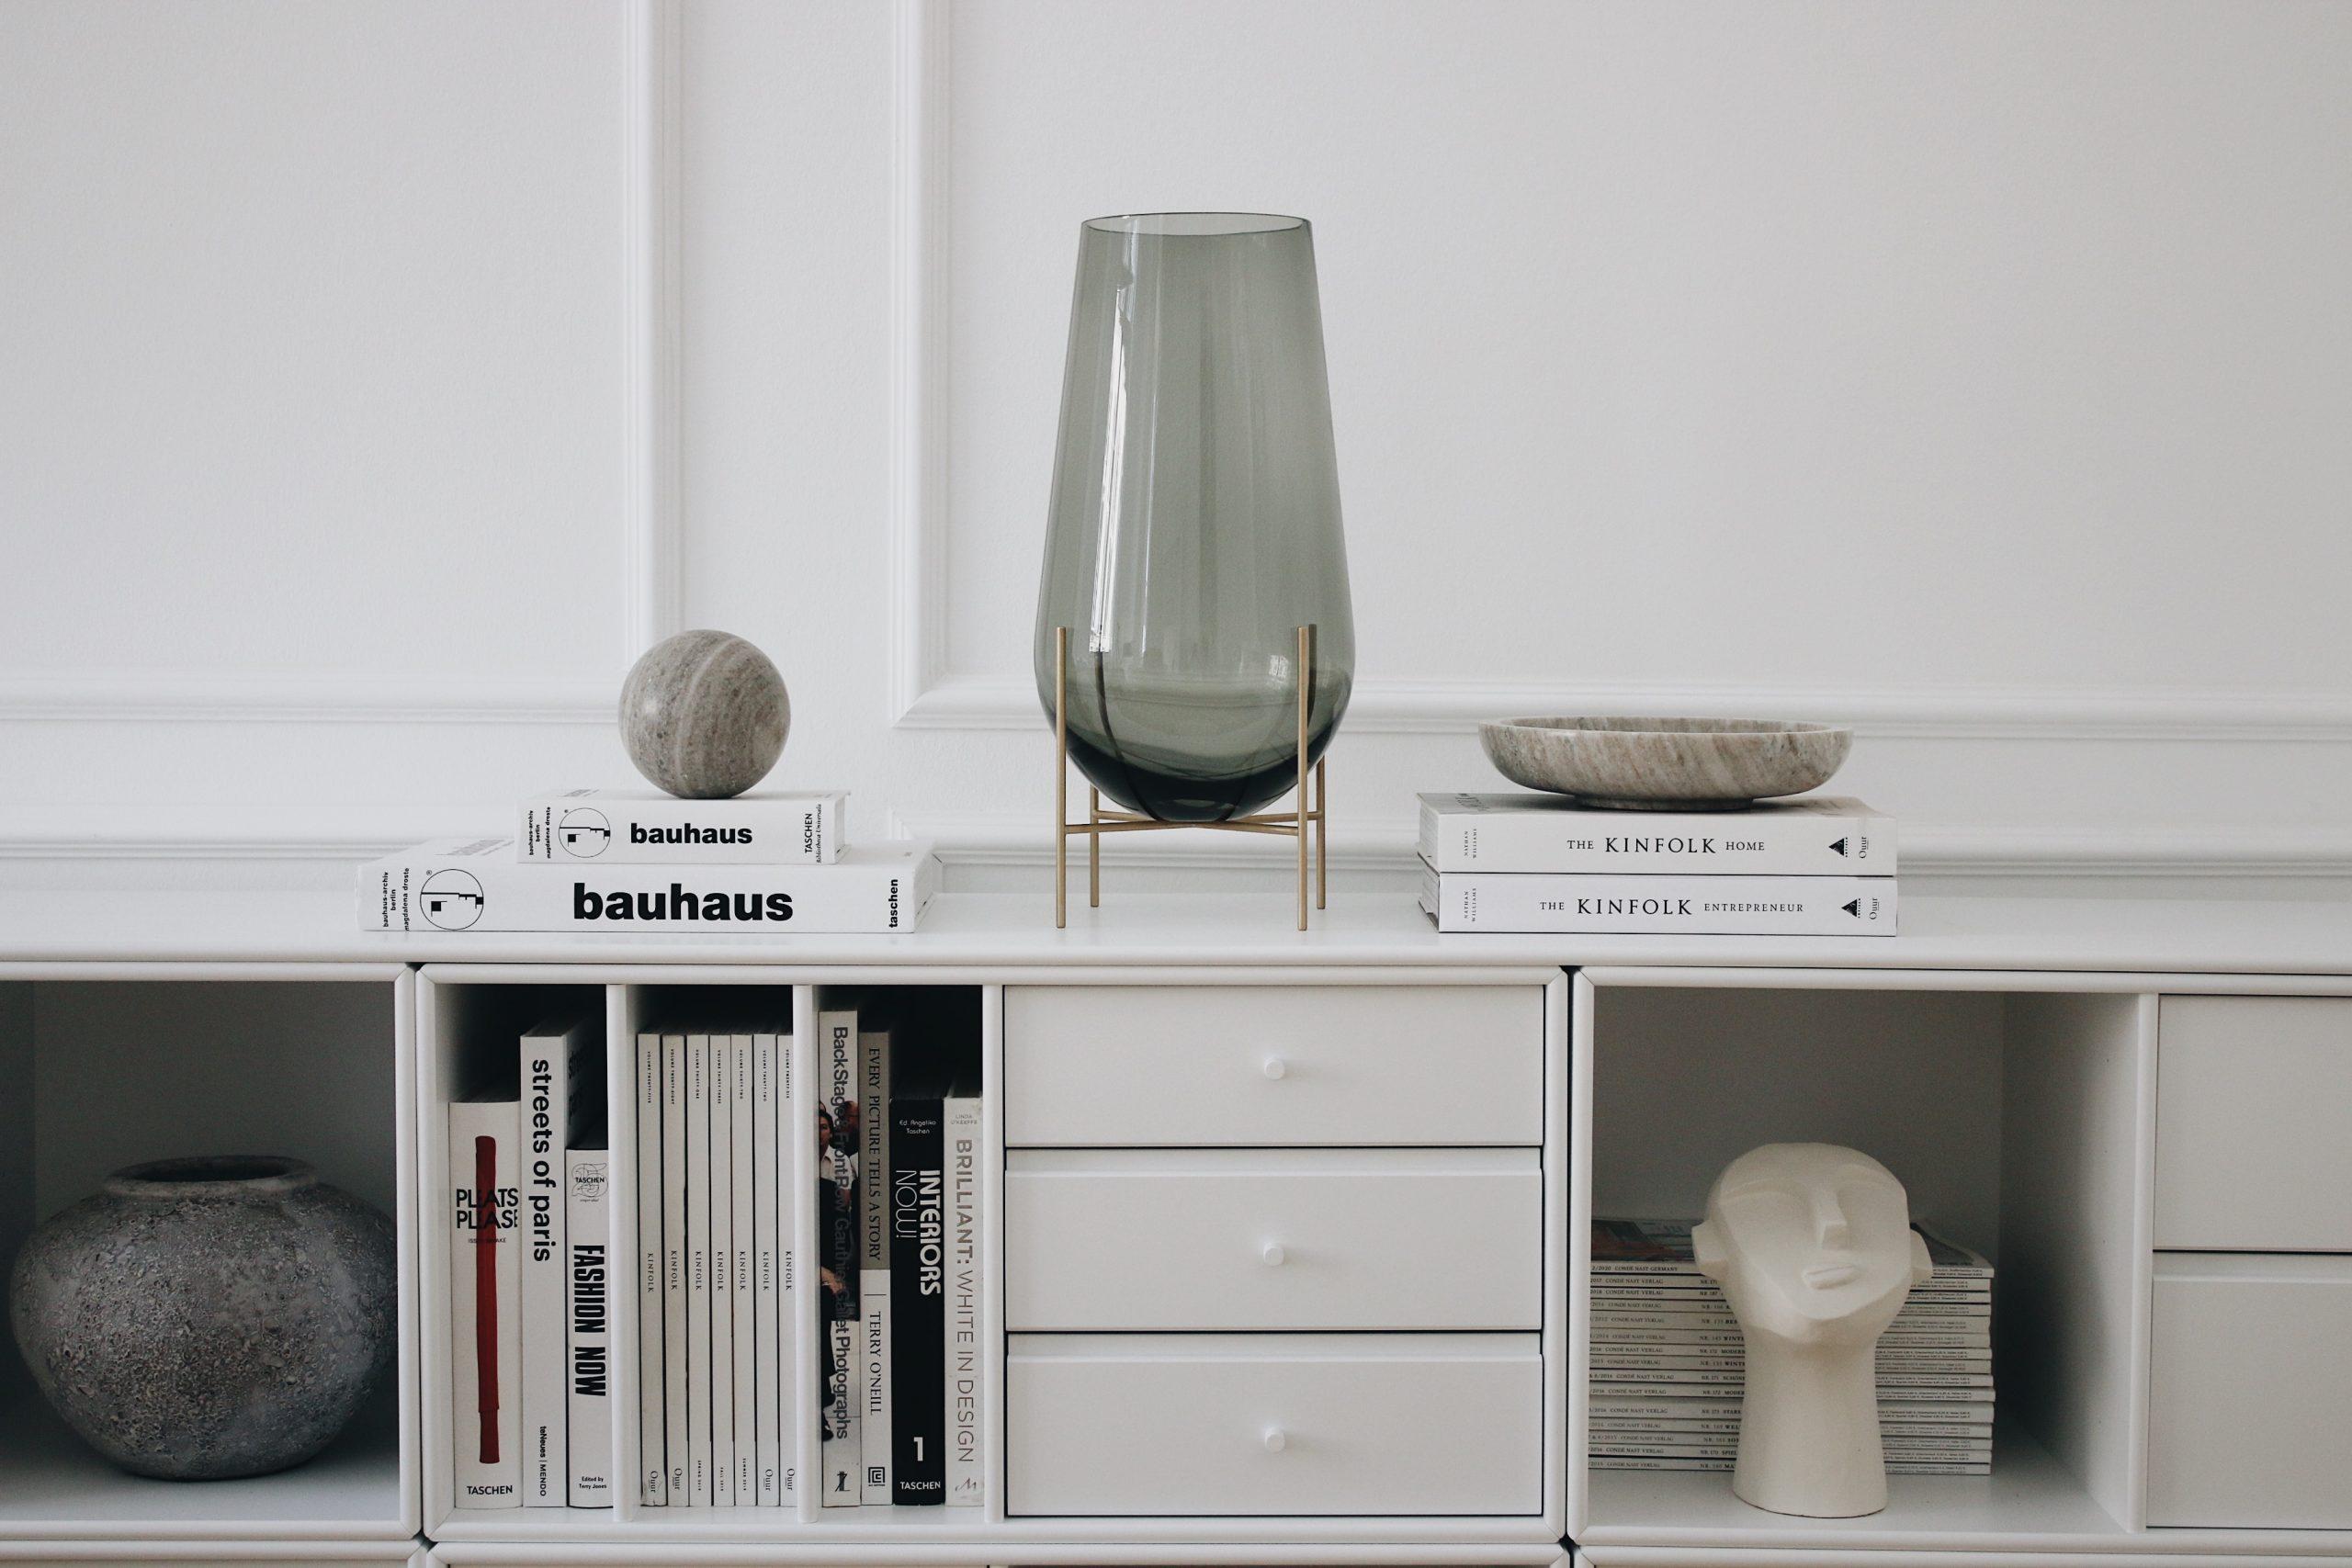 montana furniture design klassiker sebastian schmidt